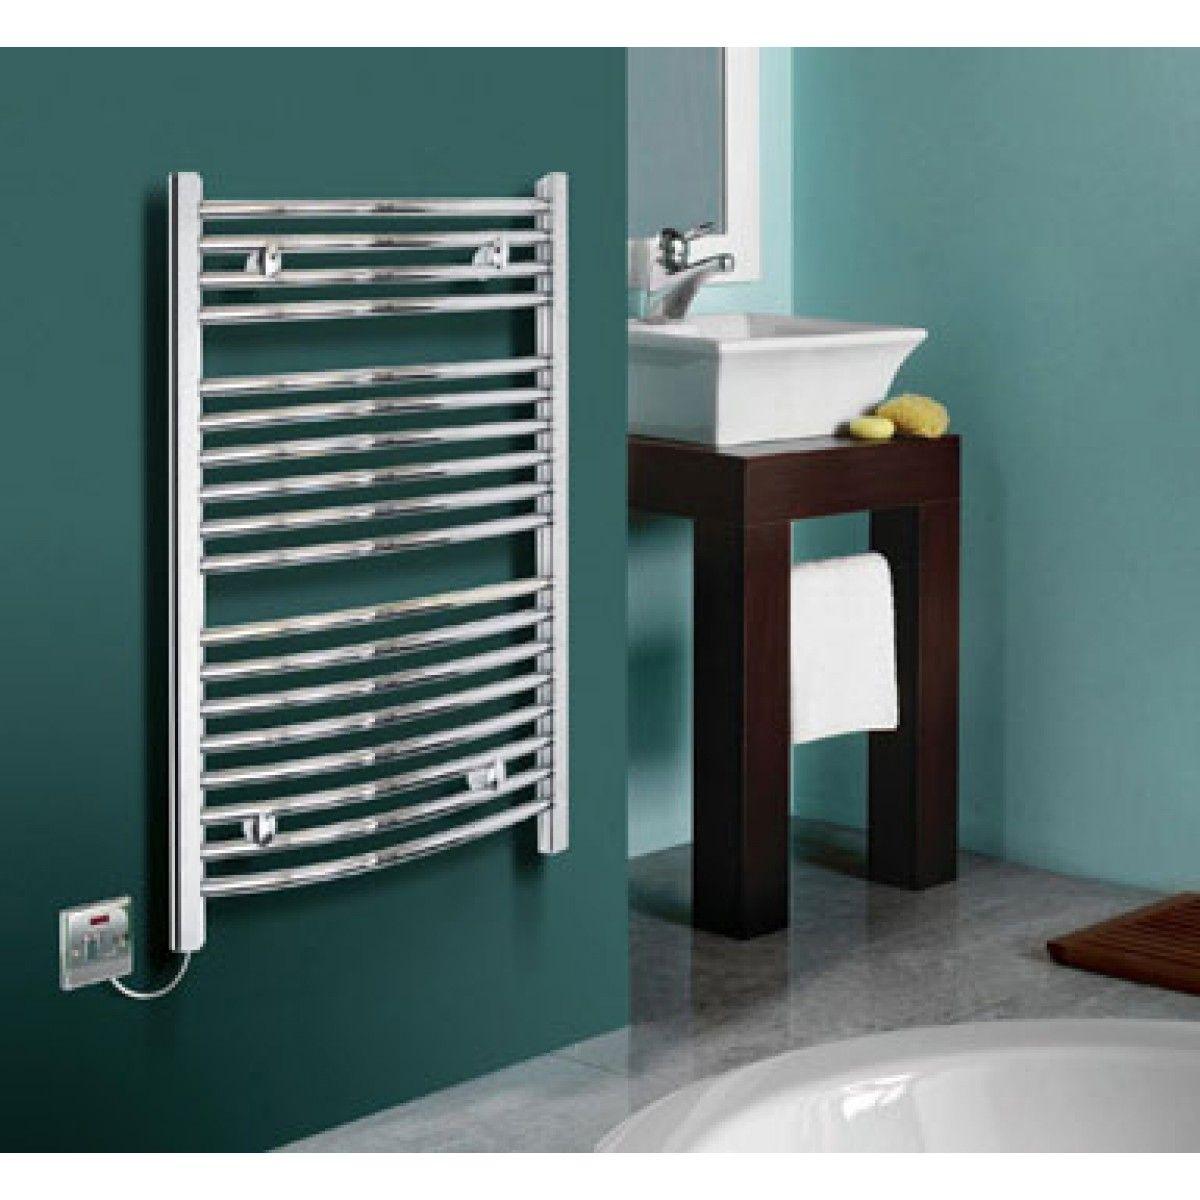 Dimplex Heated Towel Rails For Bathrooms | Bathroom Utensils ...